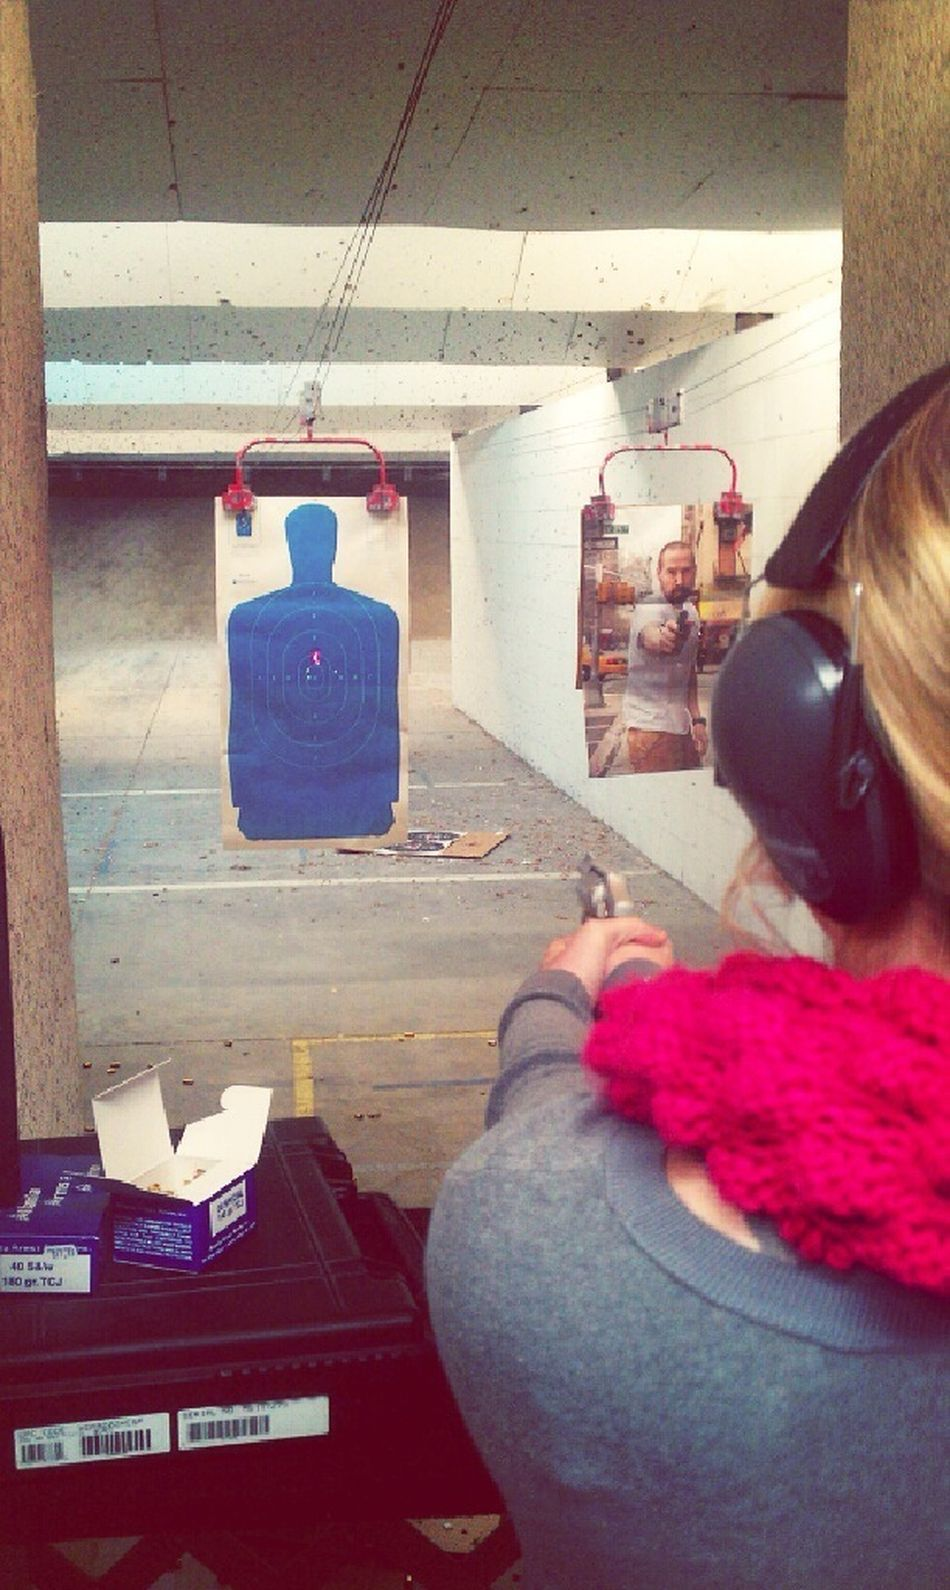 Pullin The Trigger